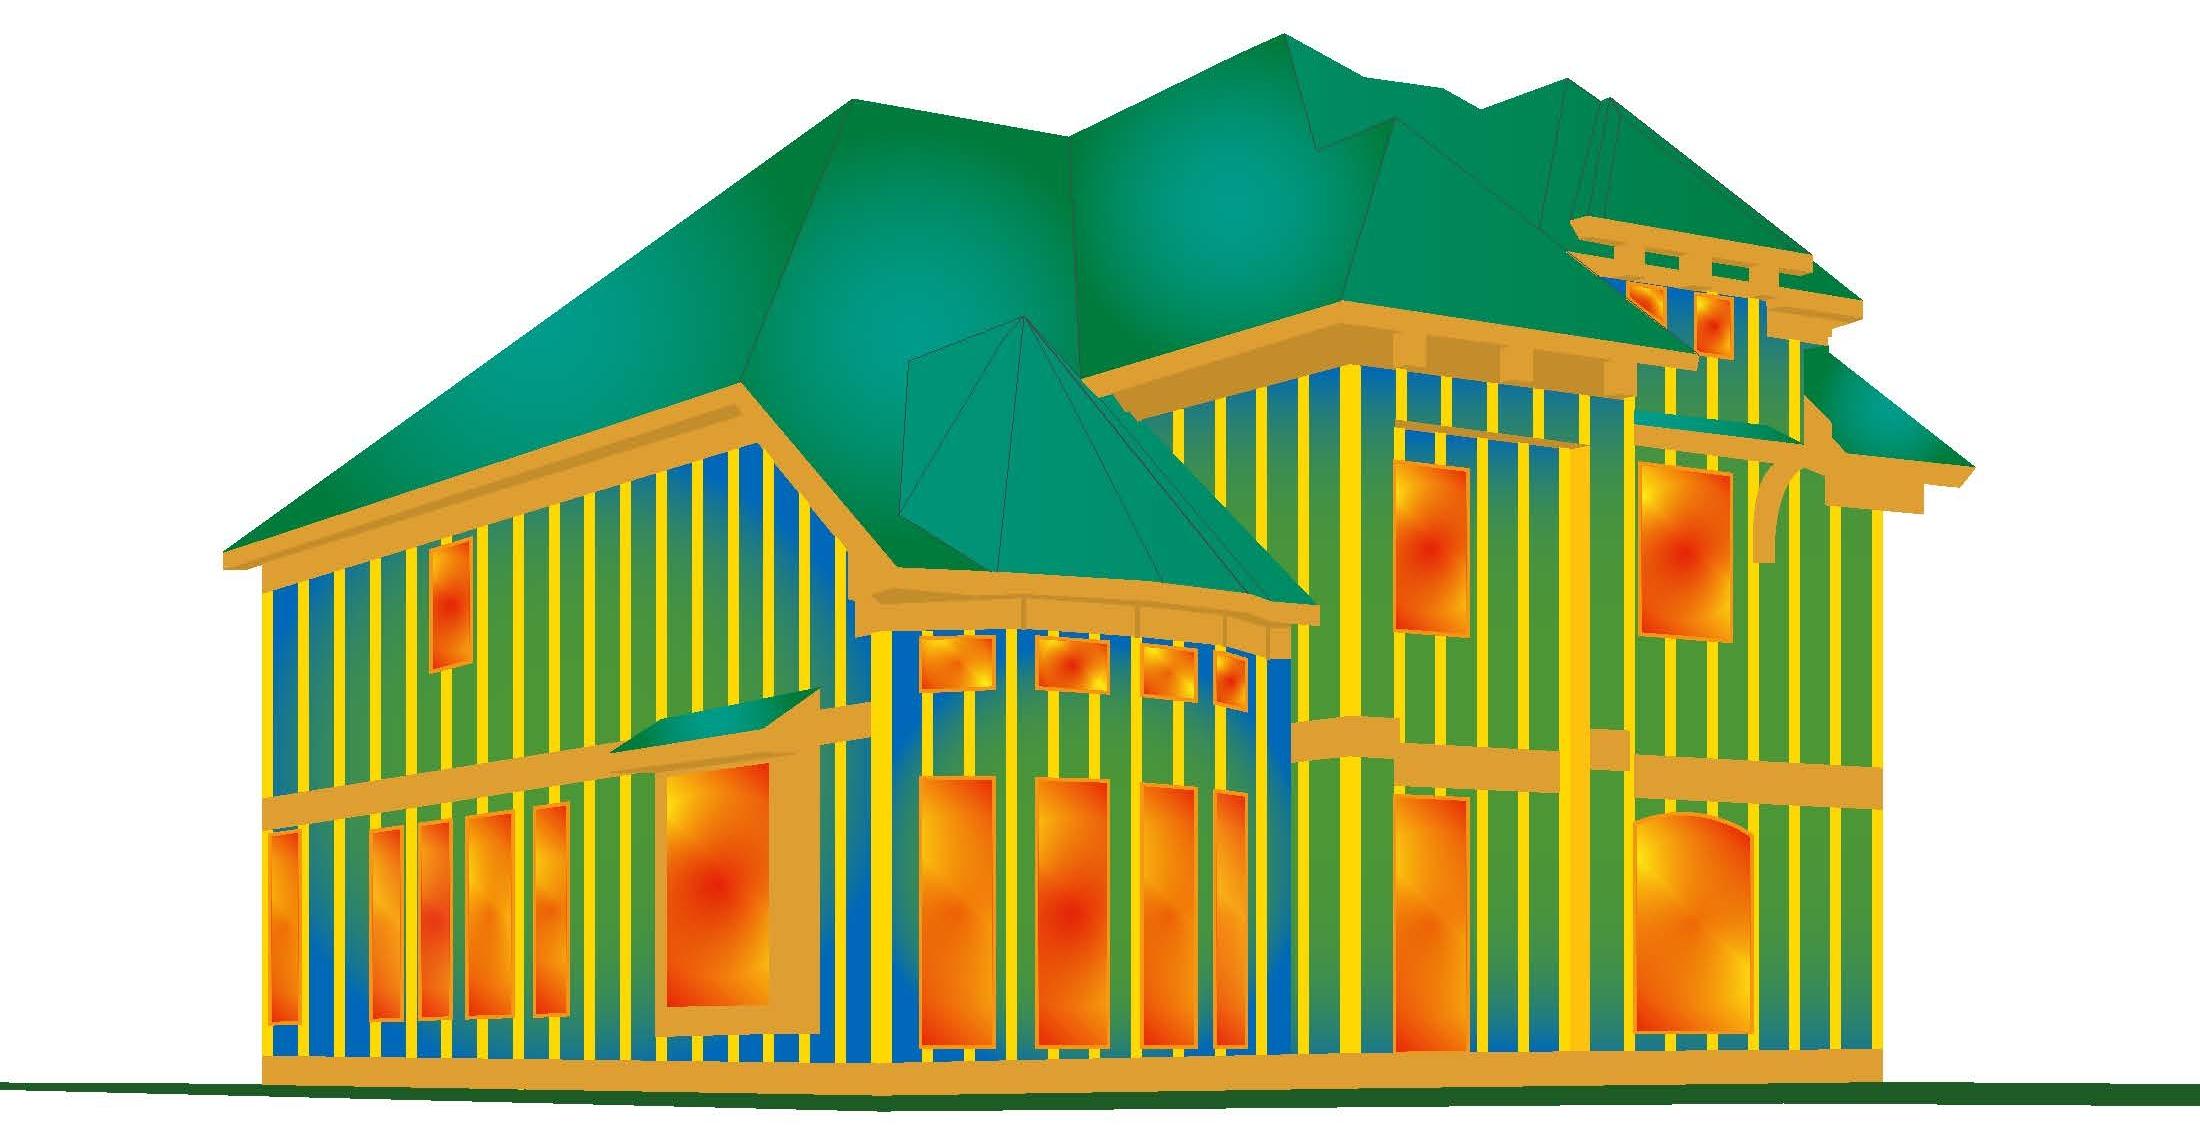 House-Infrared-Standard-NoGarage-Before CI.jpg